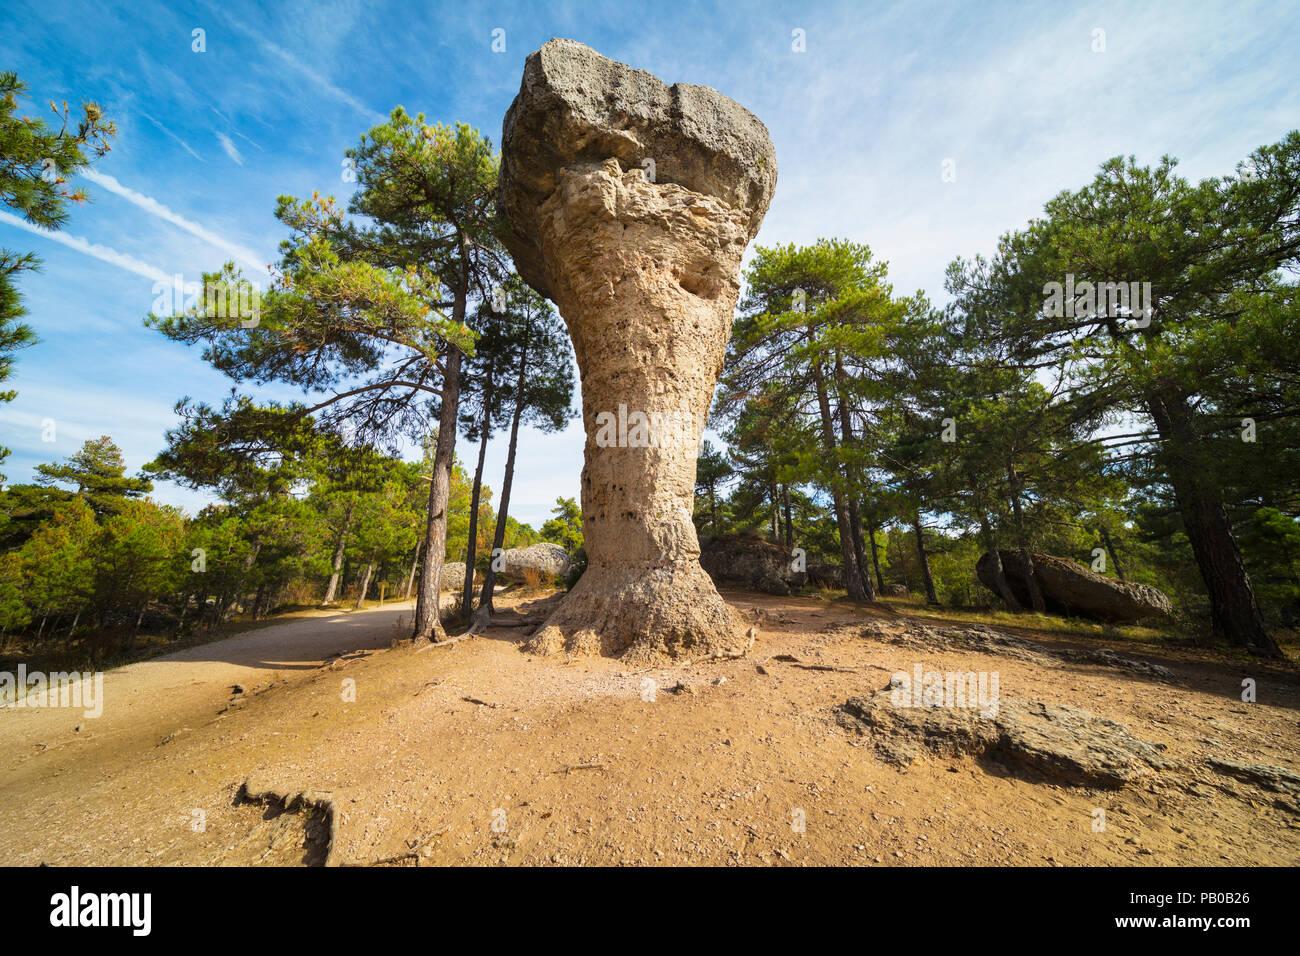 Ciudad Encantada, Provincia Cuenca, Castilla-La Mancha, in Spagna. Roccia carsica di formazione. Questo uno, chiamato El Tormo Alto, è un simbolo della Ciudad Enca Immagini Stock